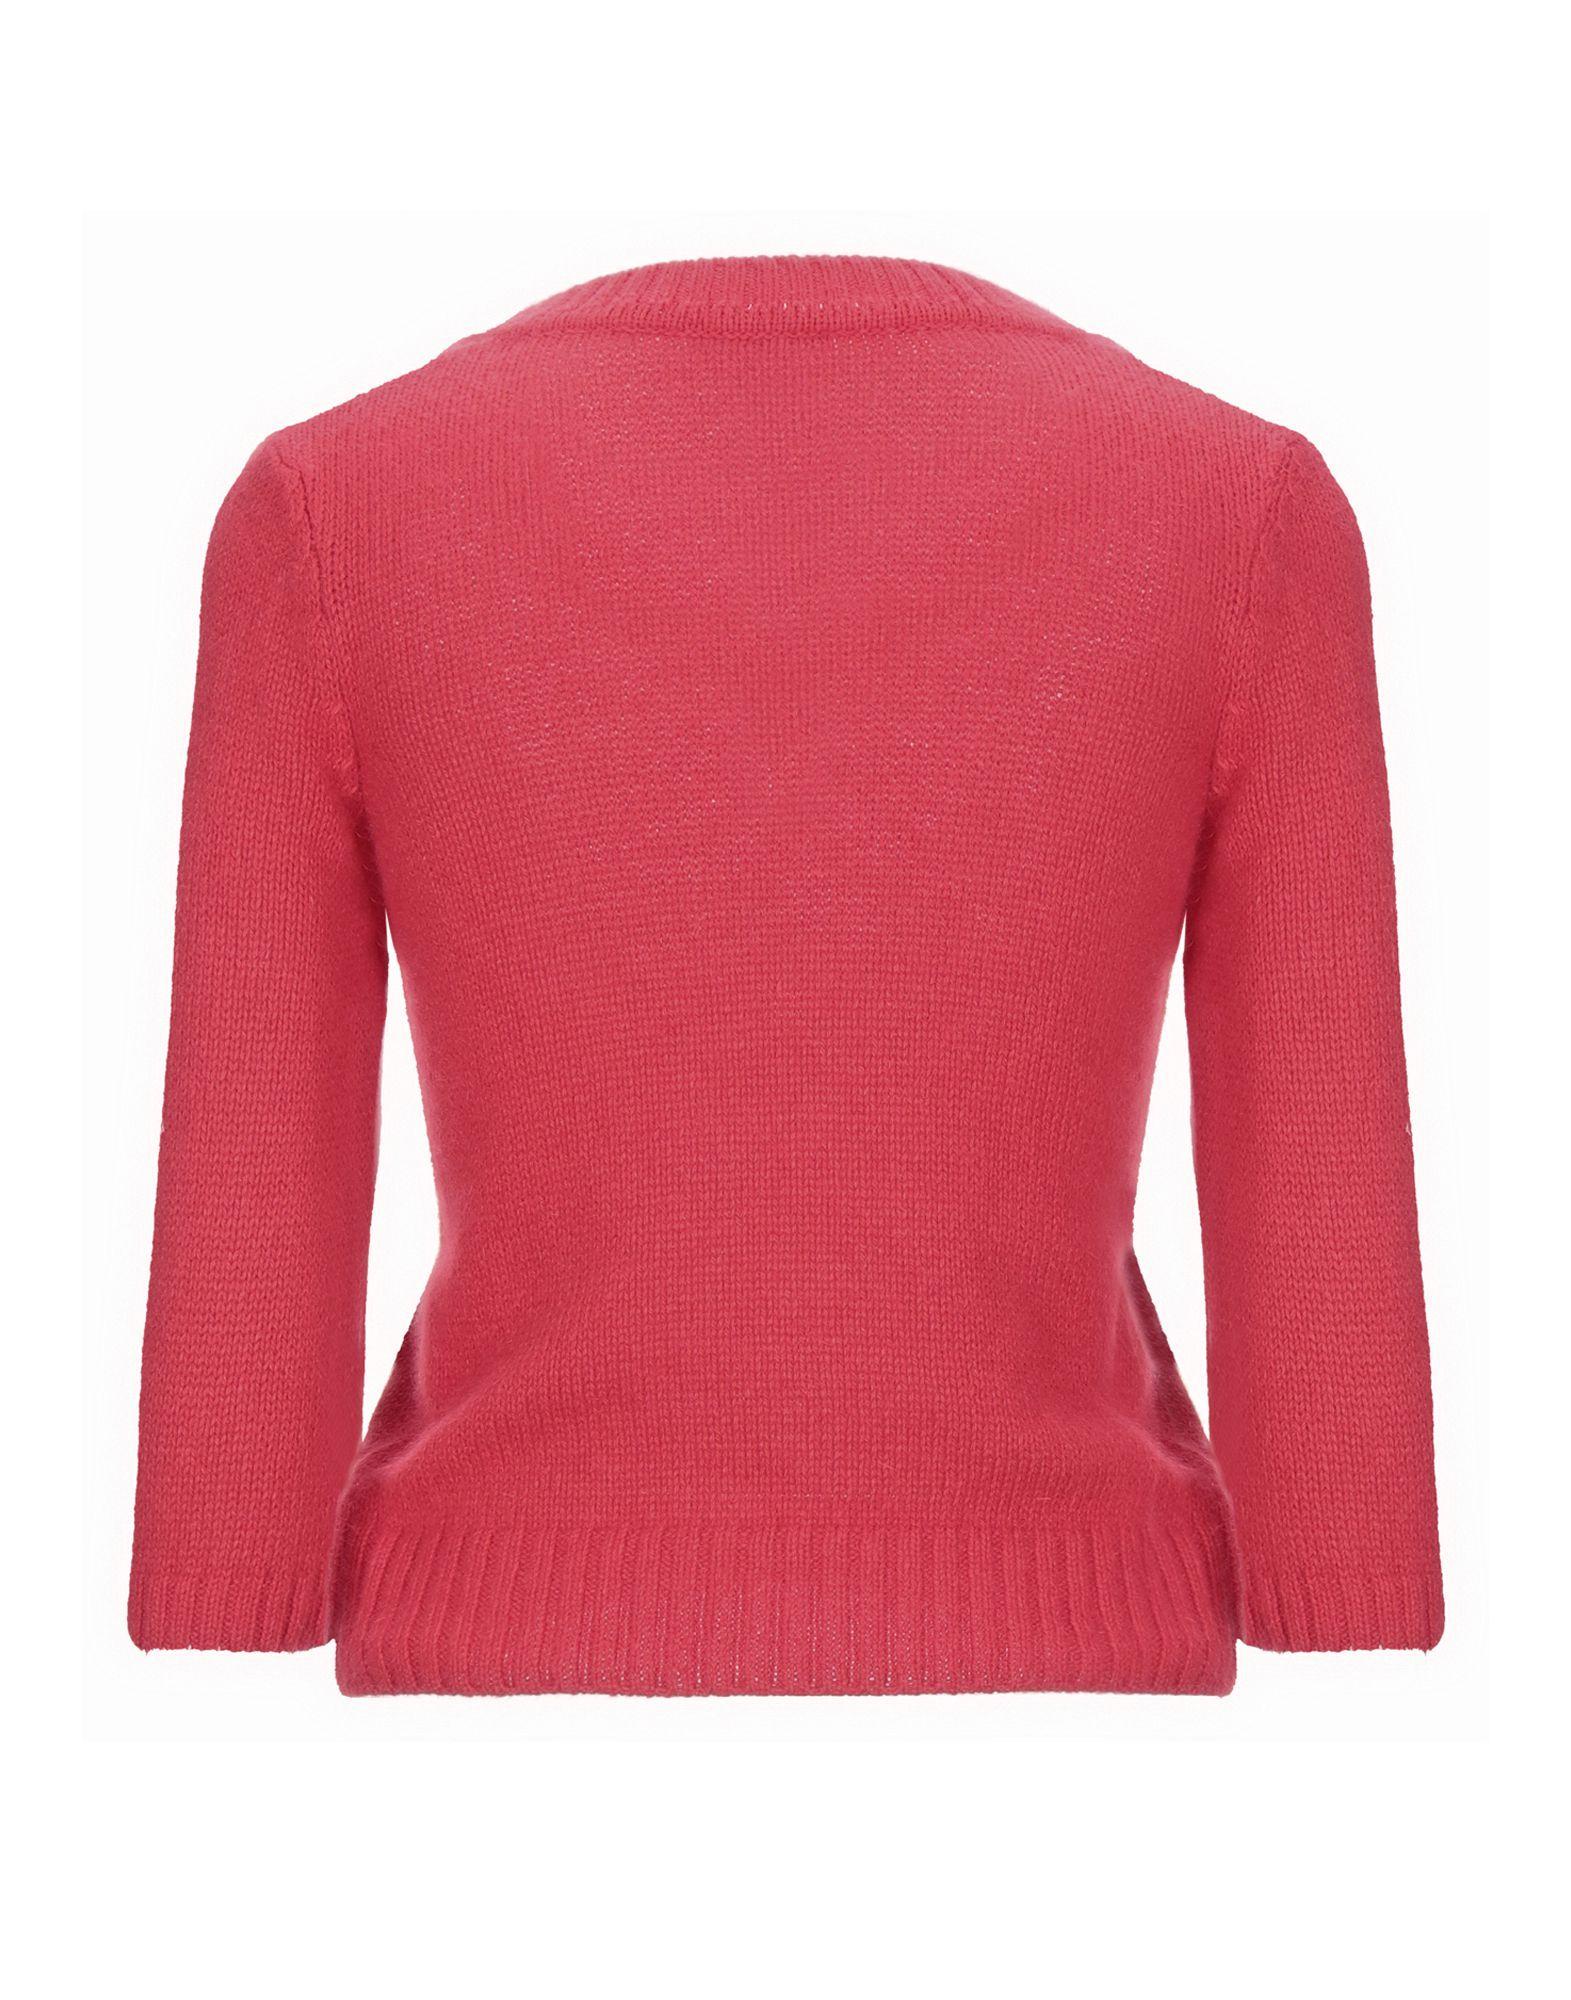 Knitwear Dixie Red Women's Angora